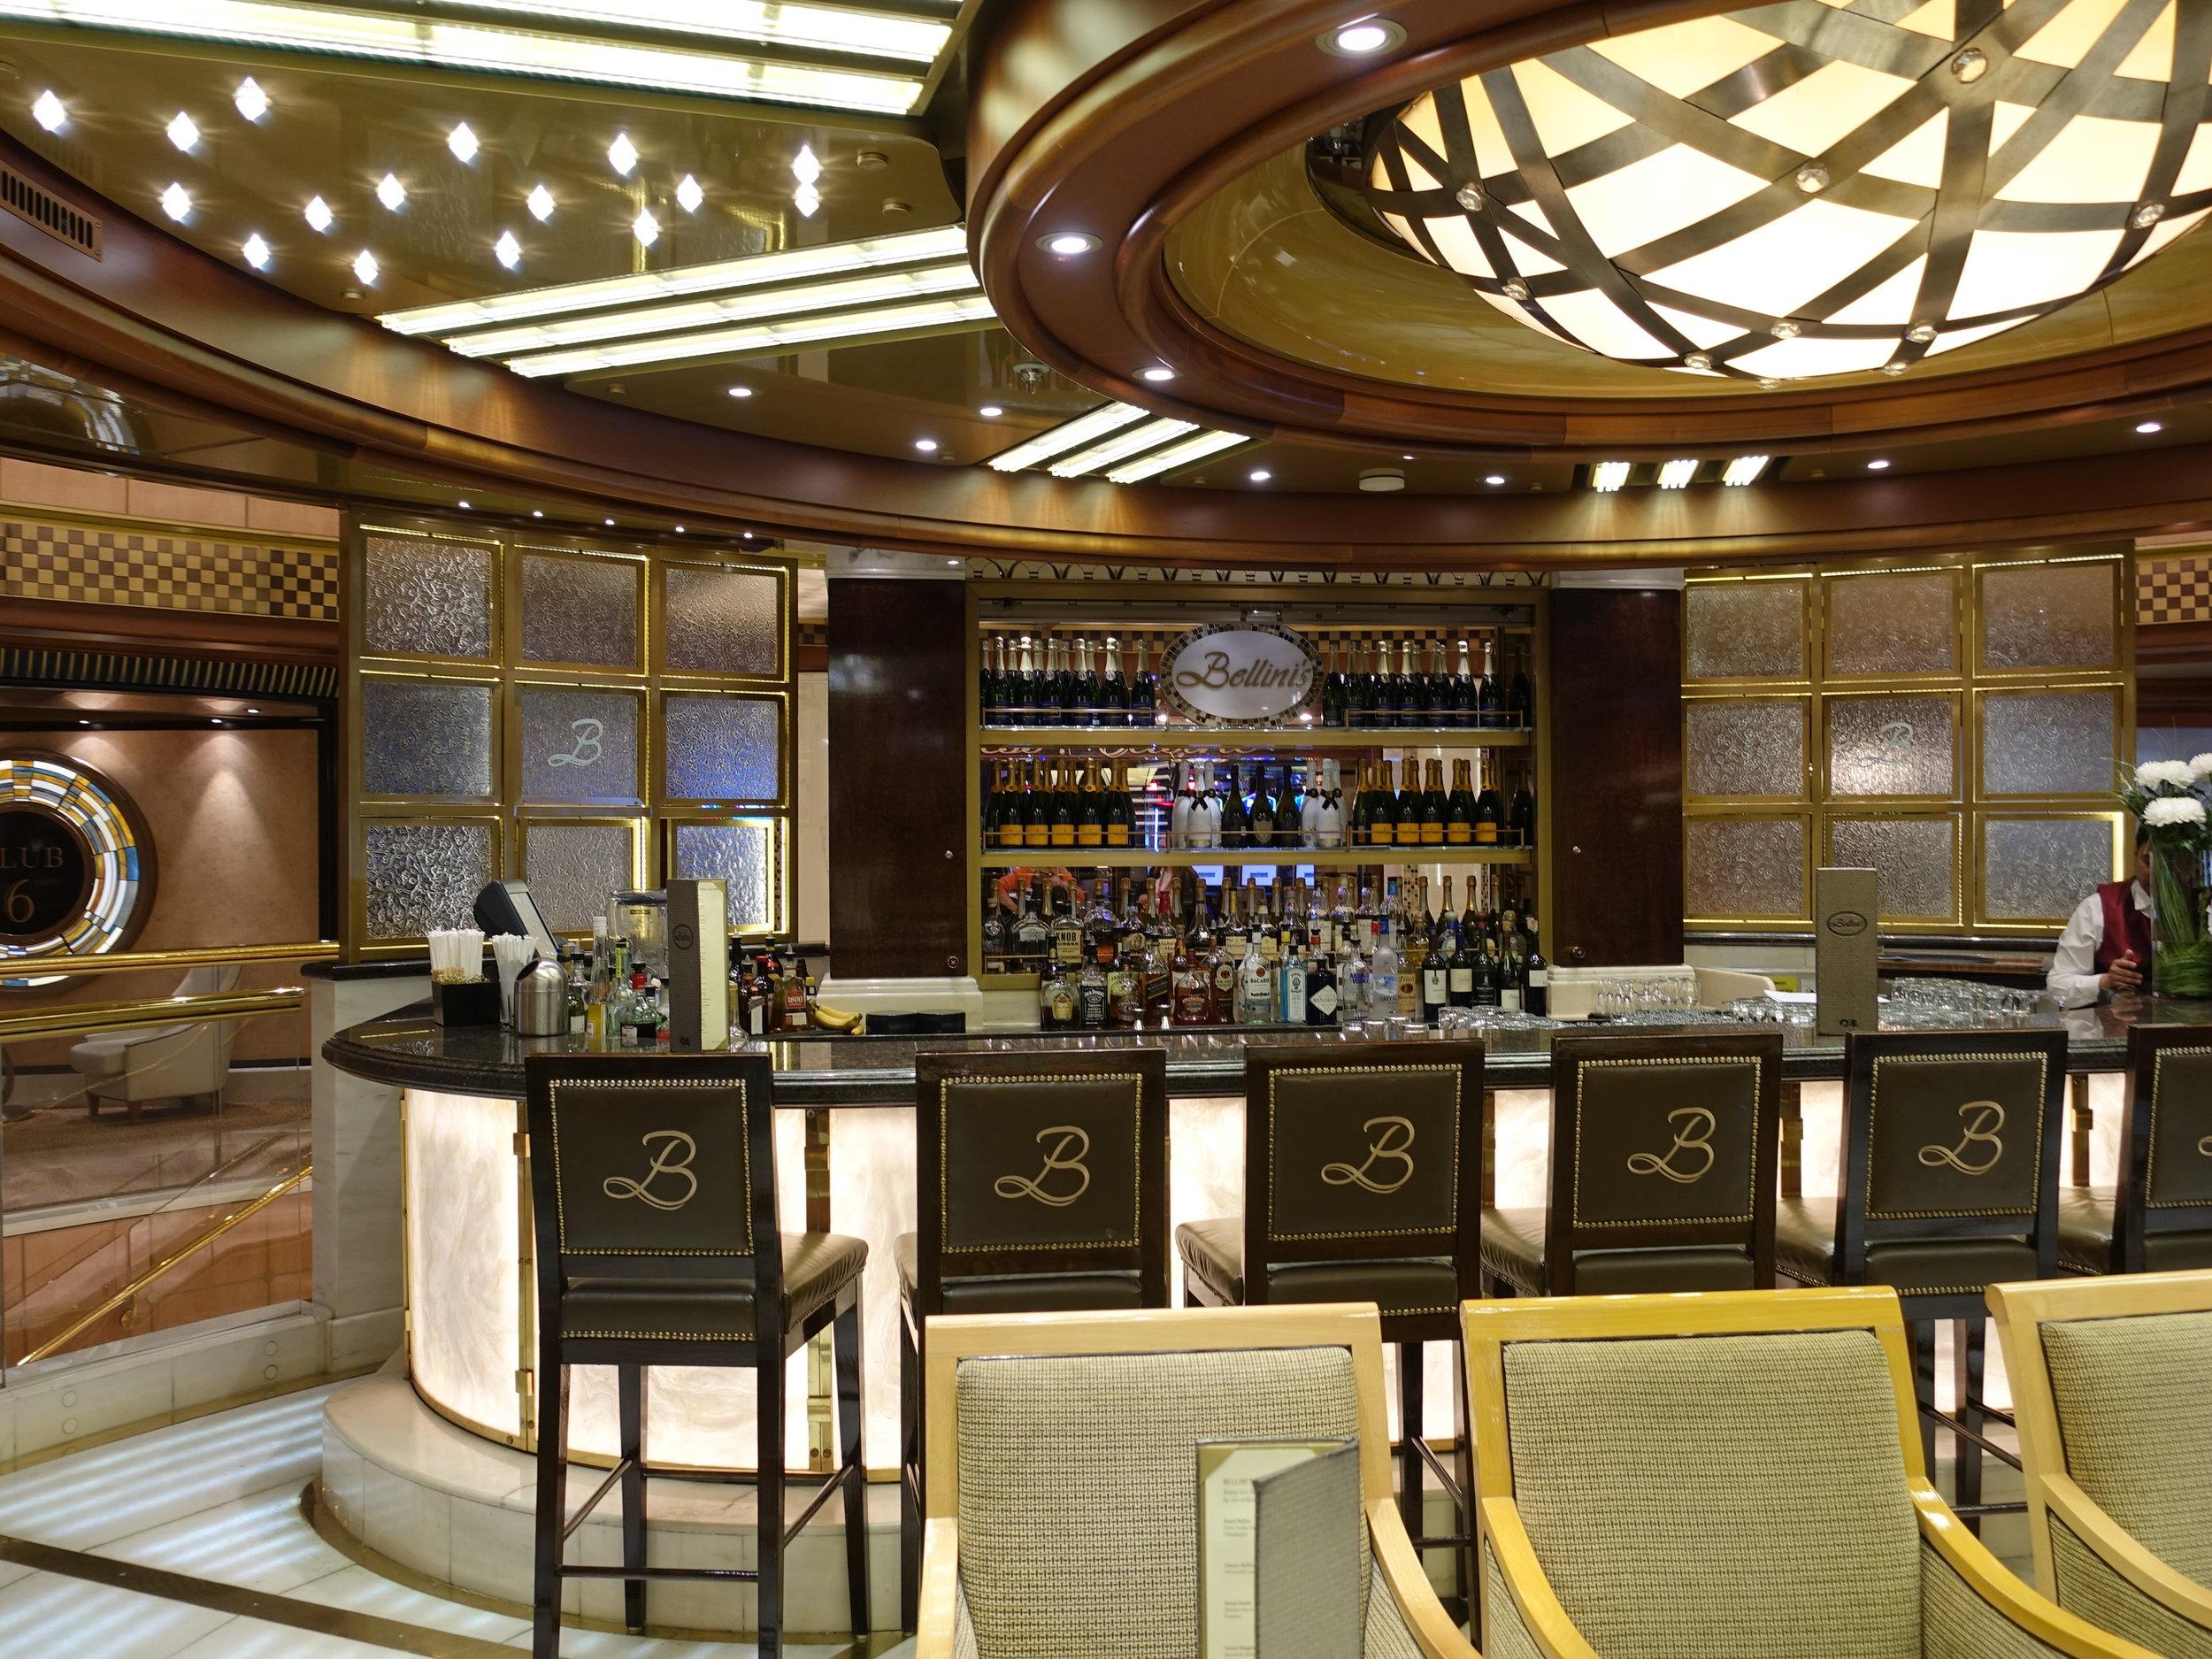 The beautiful Bellini's bar